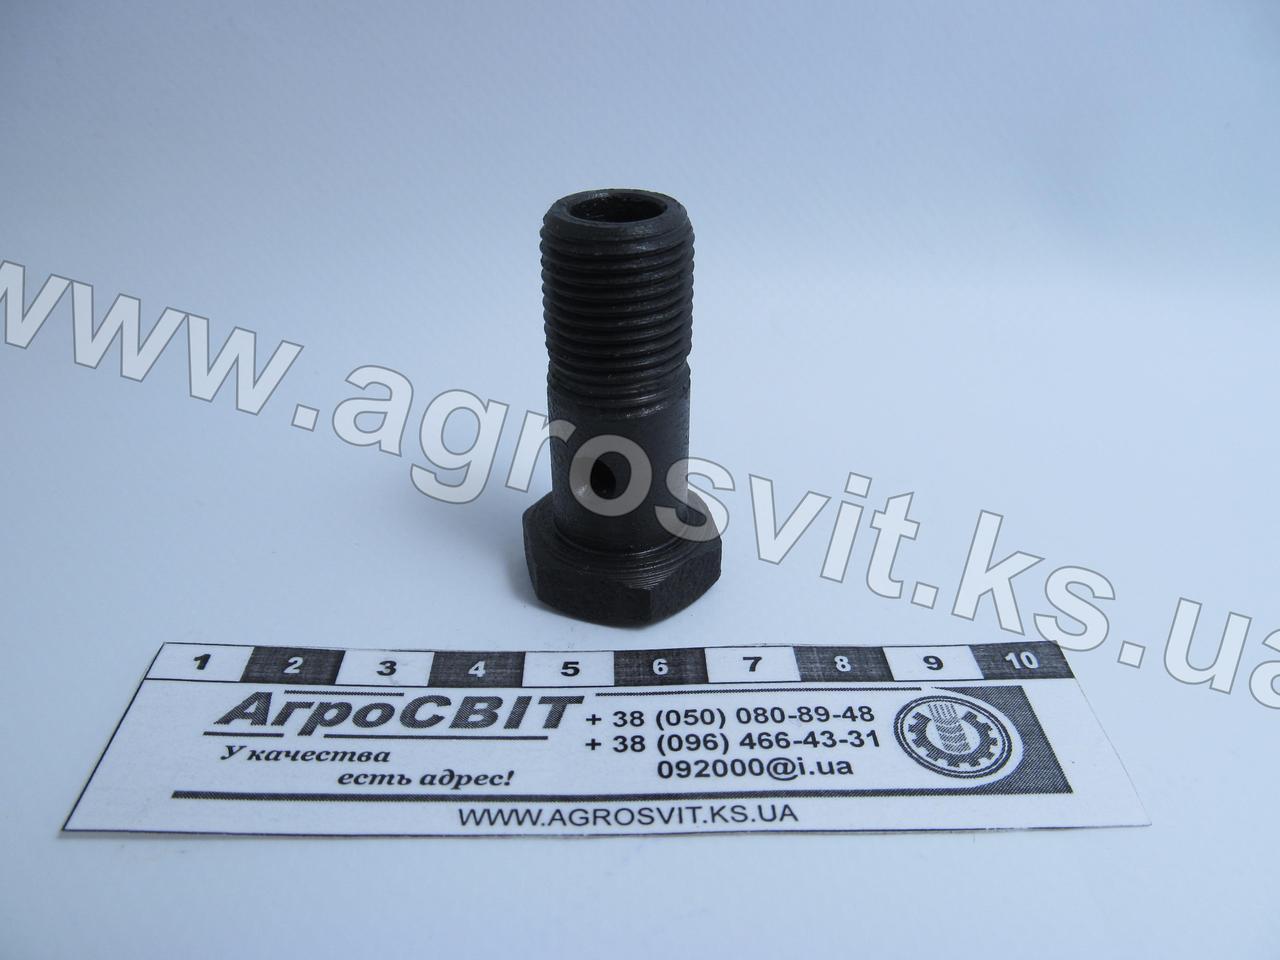 Болт-штуцер М16х1,5 х 48 (под 1 наконечник), кат. № 310264-П29